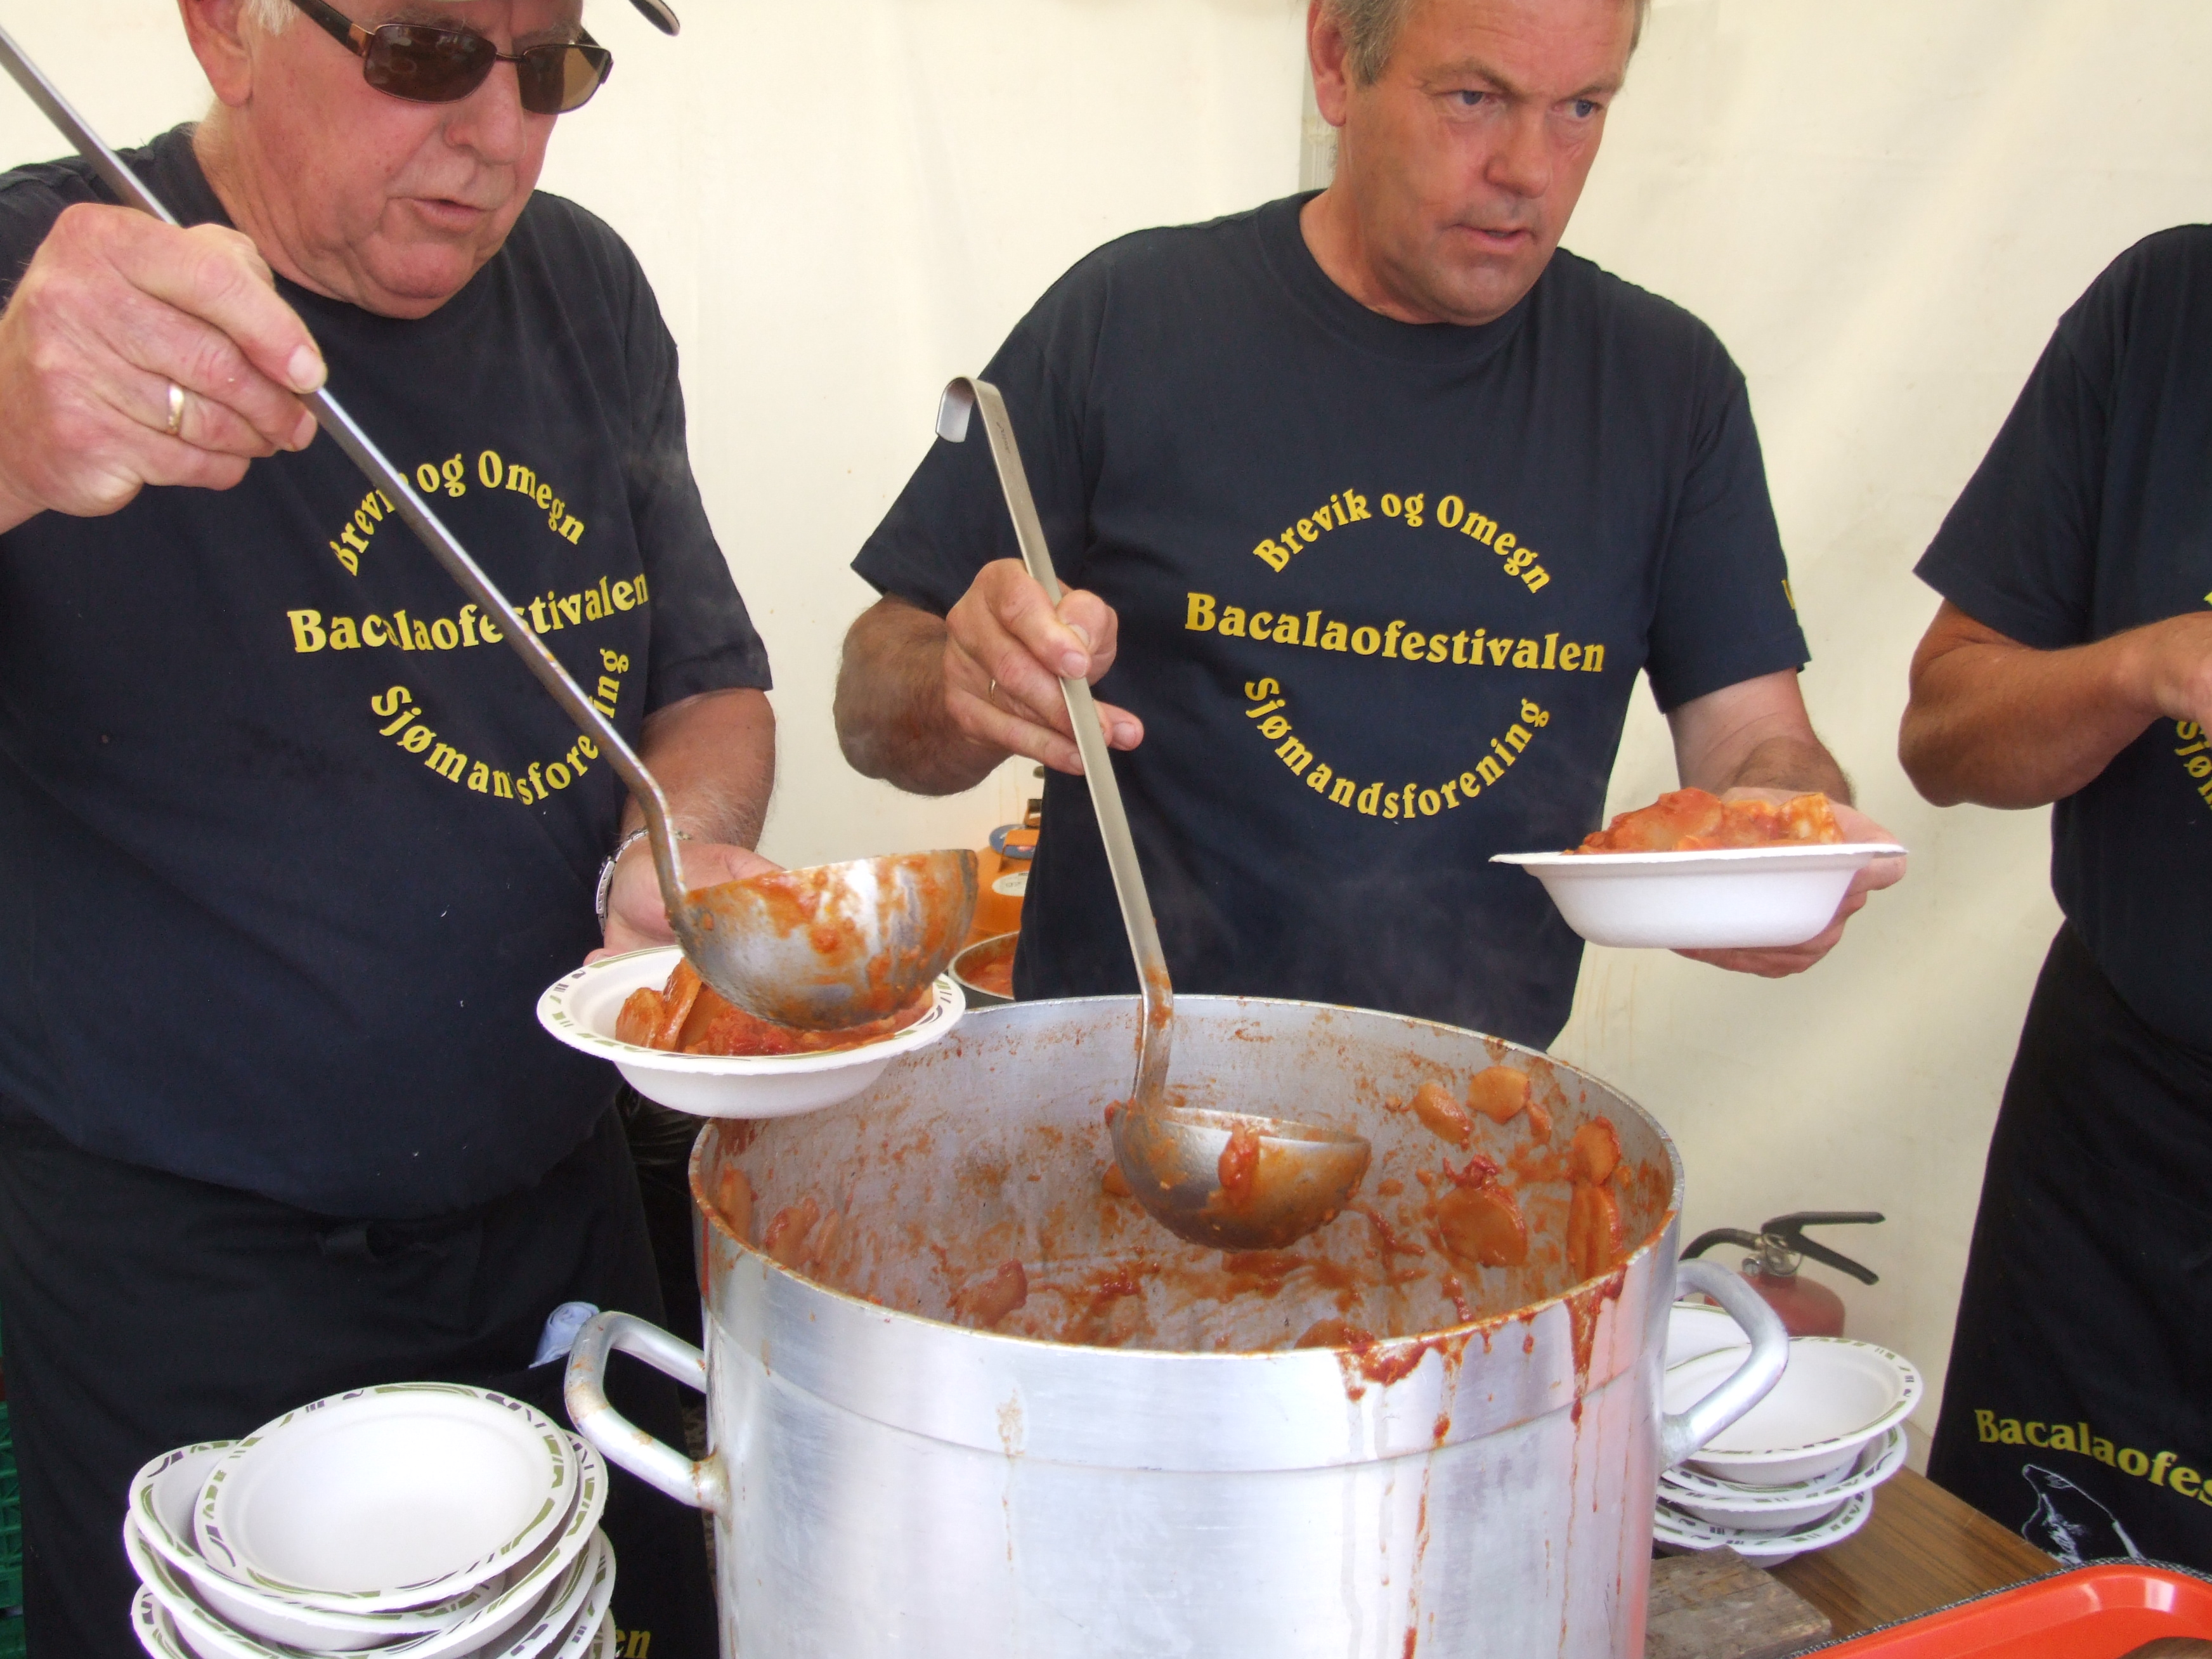 Bacalao festival